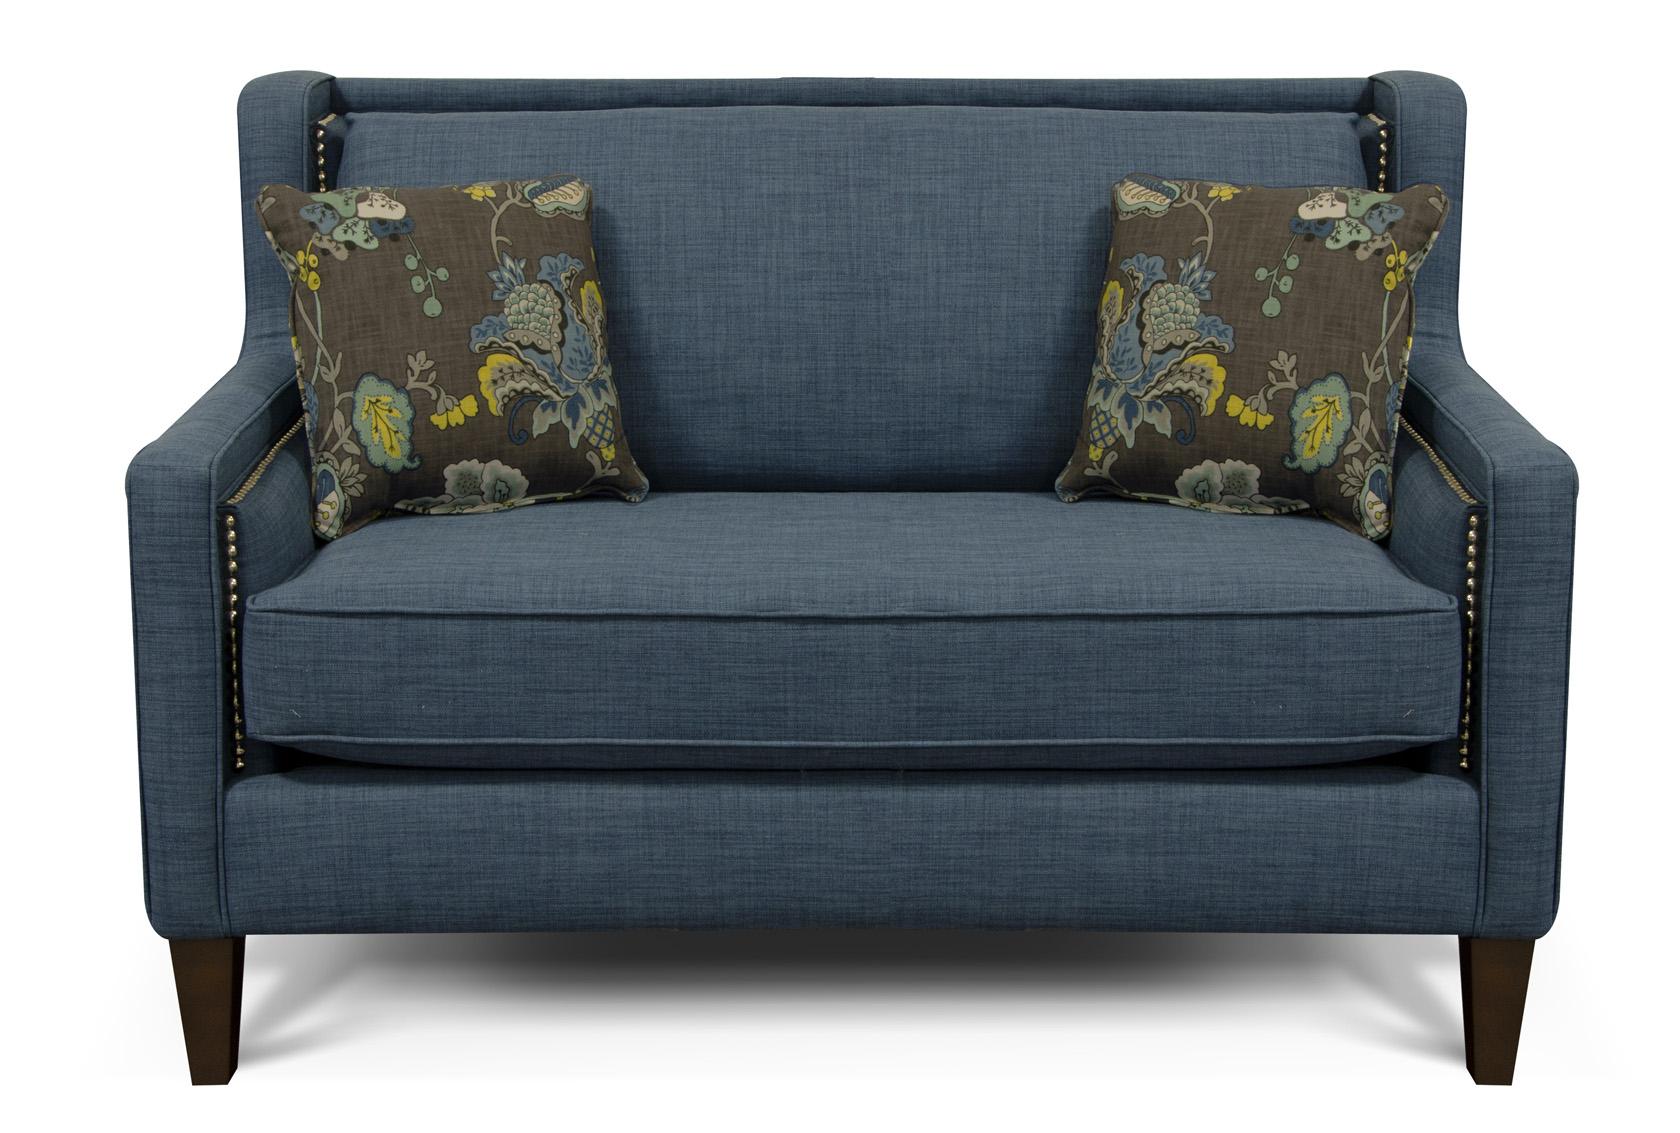 england-furniture-reviews-Roma-Blue-Leopold-Aquamarine-loveseat